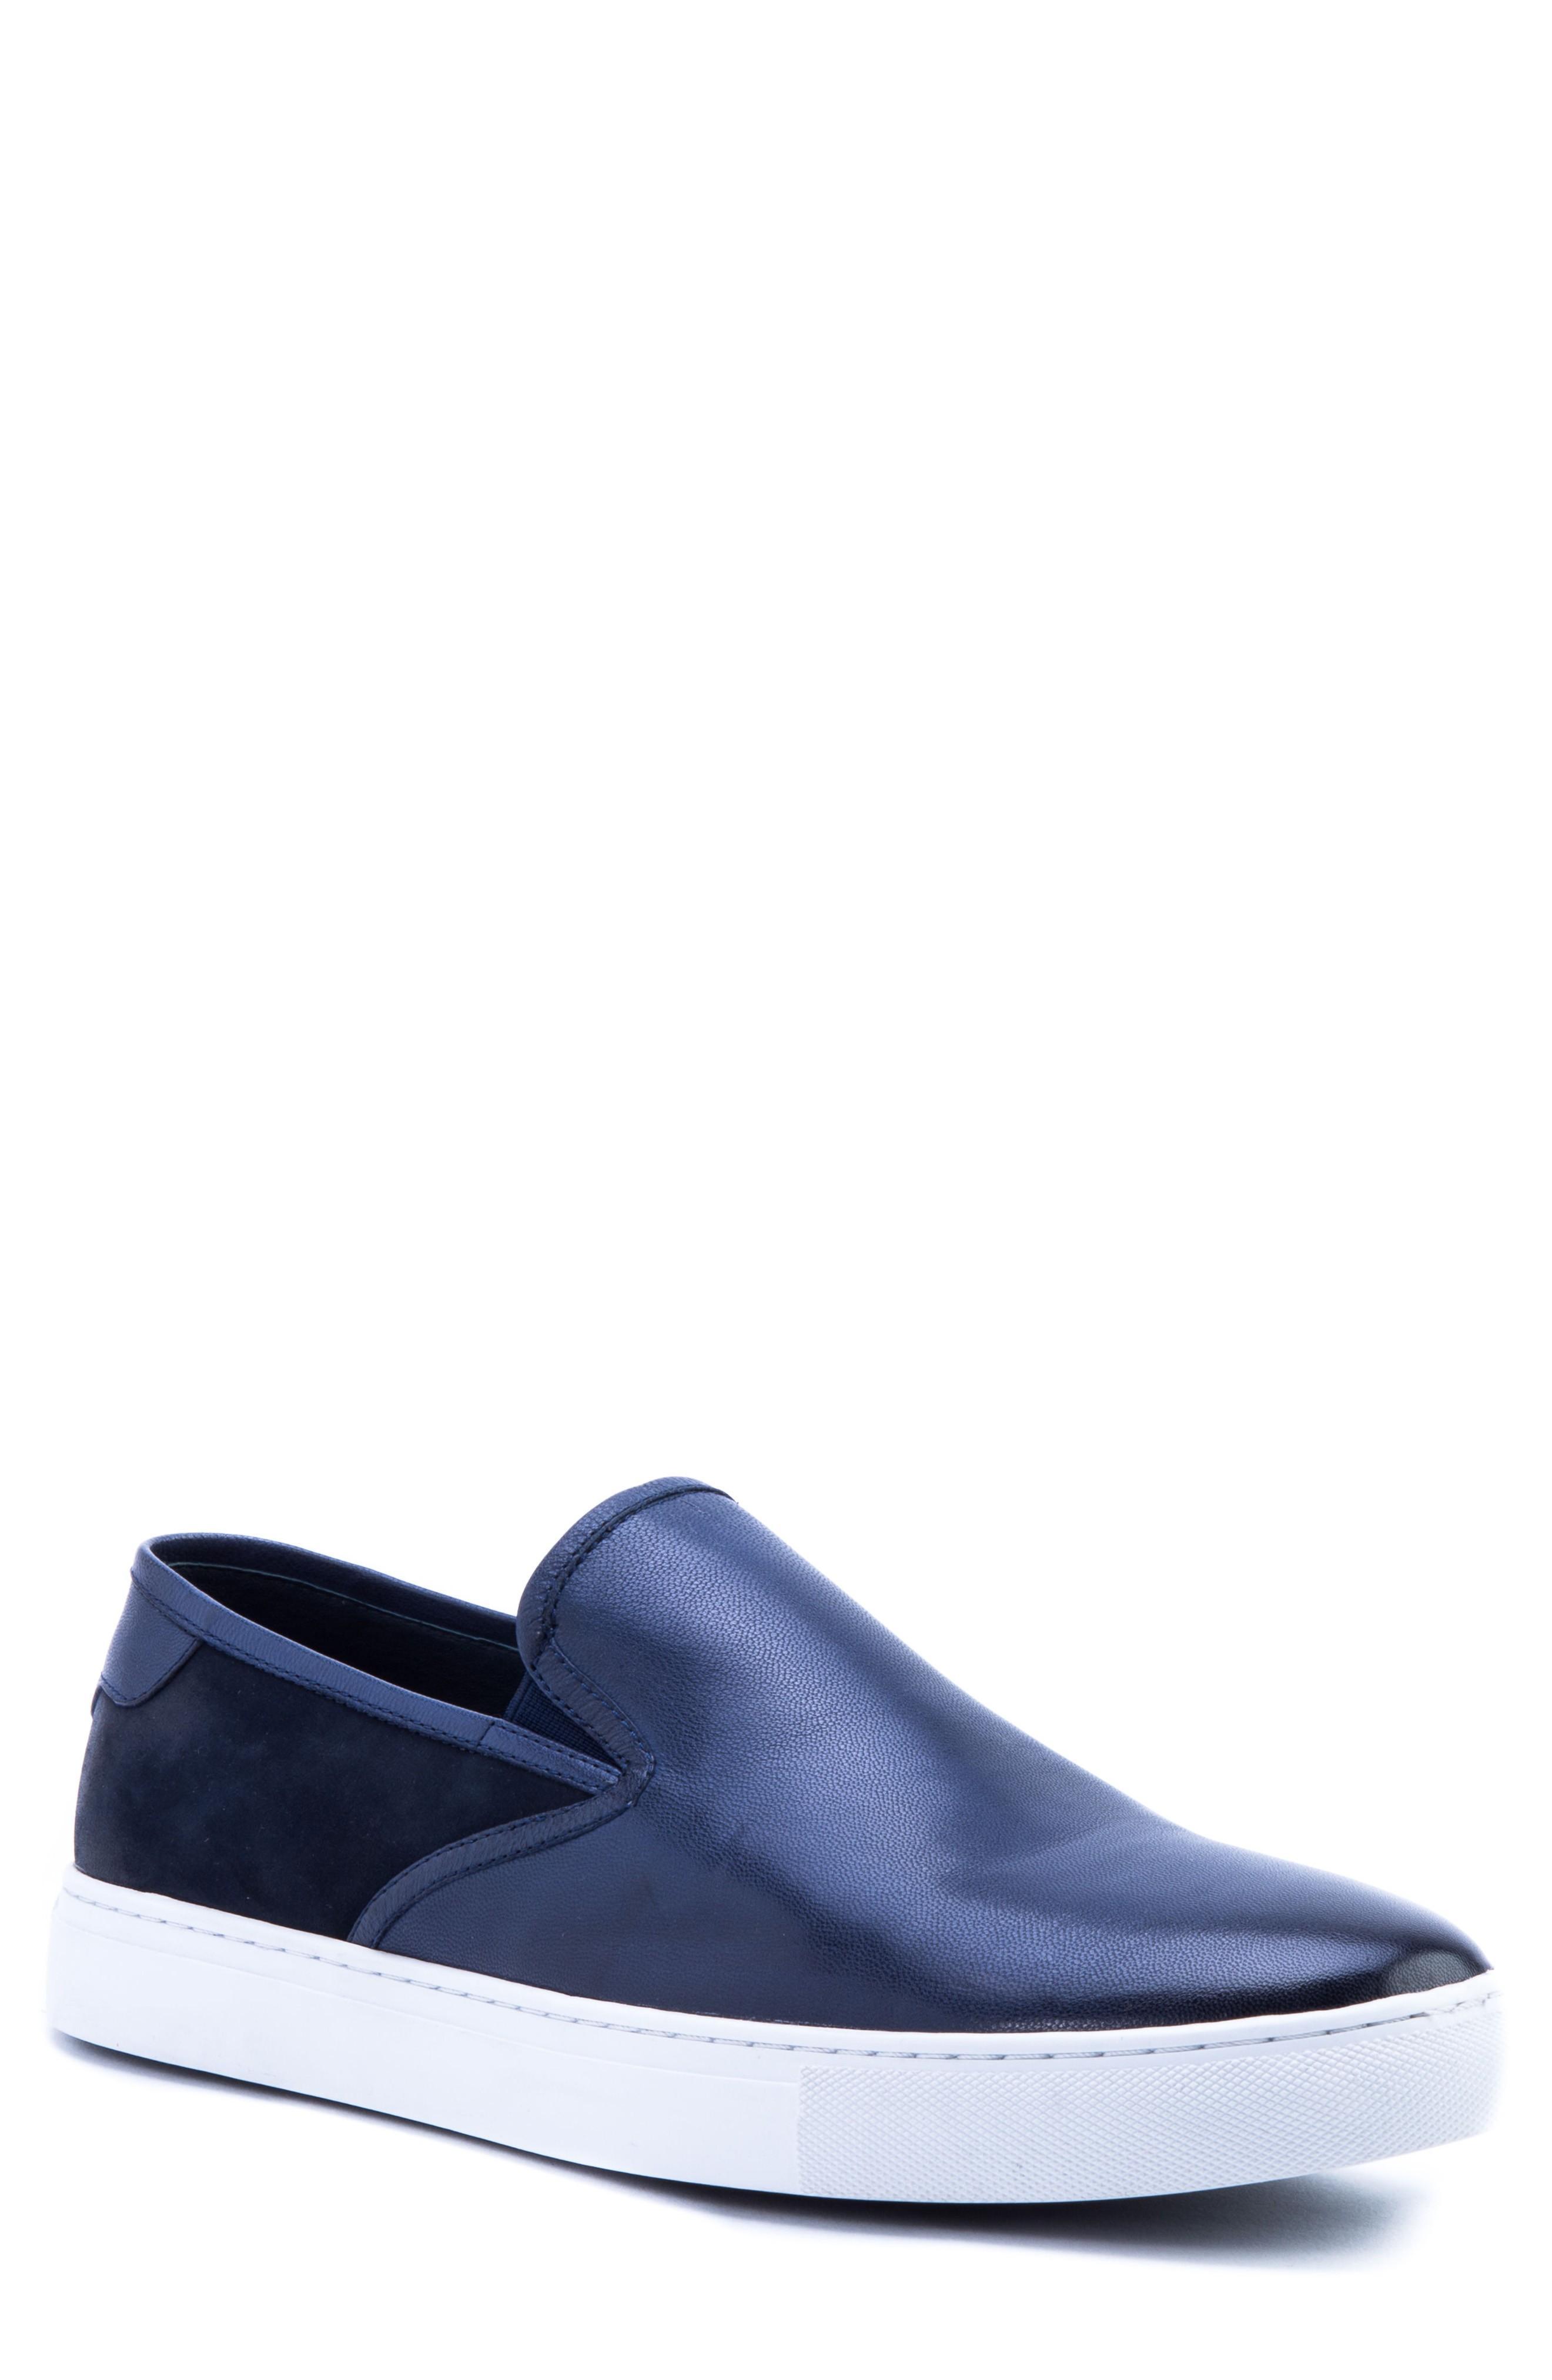 Zanzara Duchamps Slip-on Sneaker In Navy Leather/ Suede